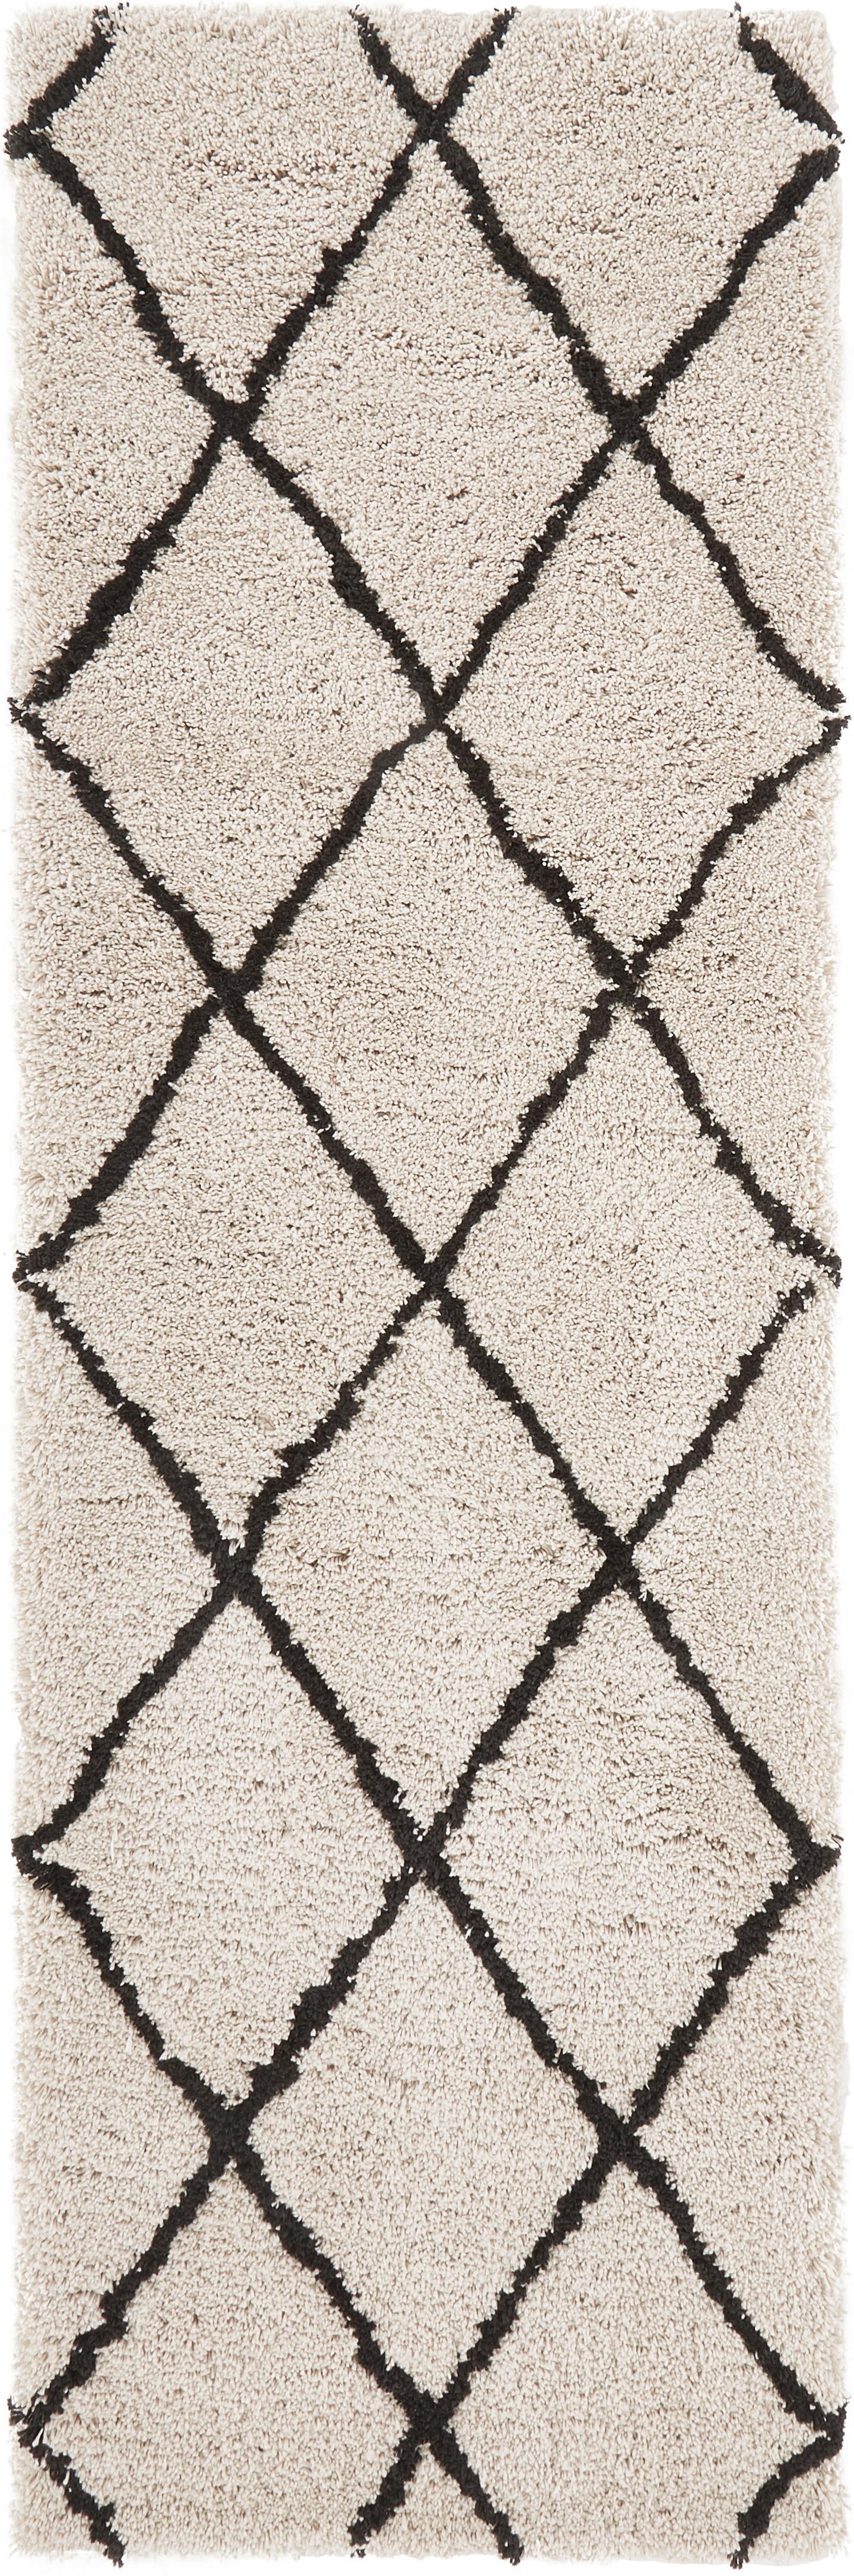 Handgetufte loper Naima, Bovenzijde: 100% polyester, Onderzijde: 100% katoen, Beige, zwart, 80 x 250 cm